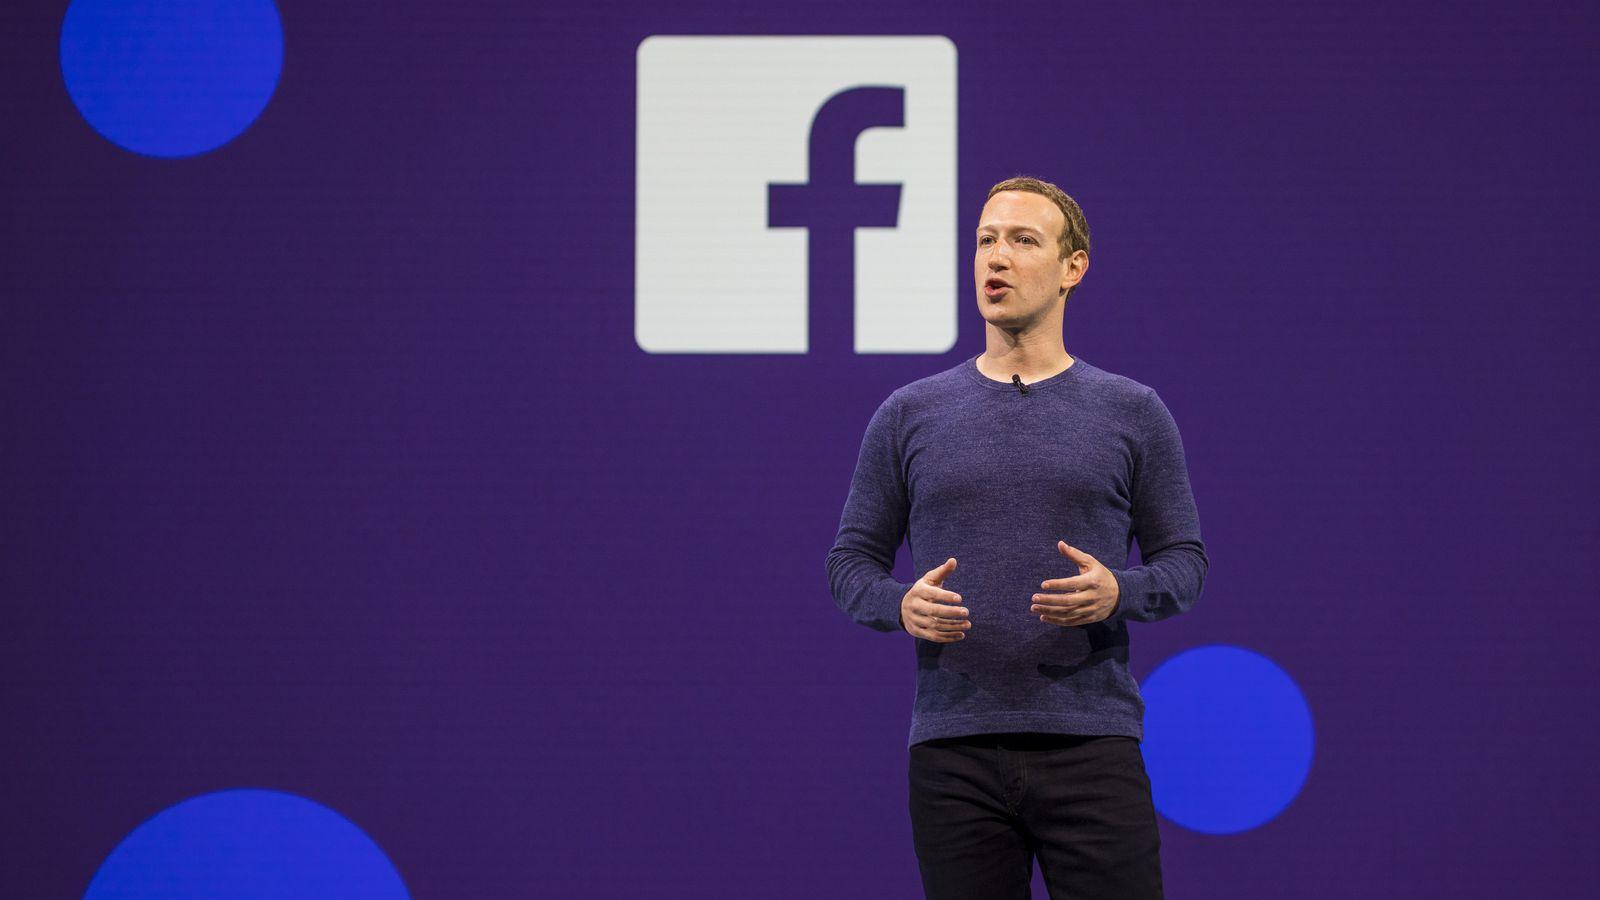 50 million Facebook profiles hacked!